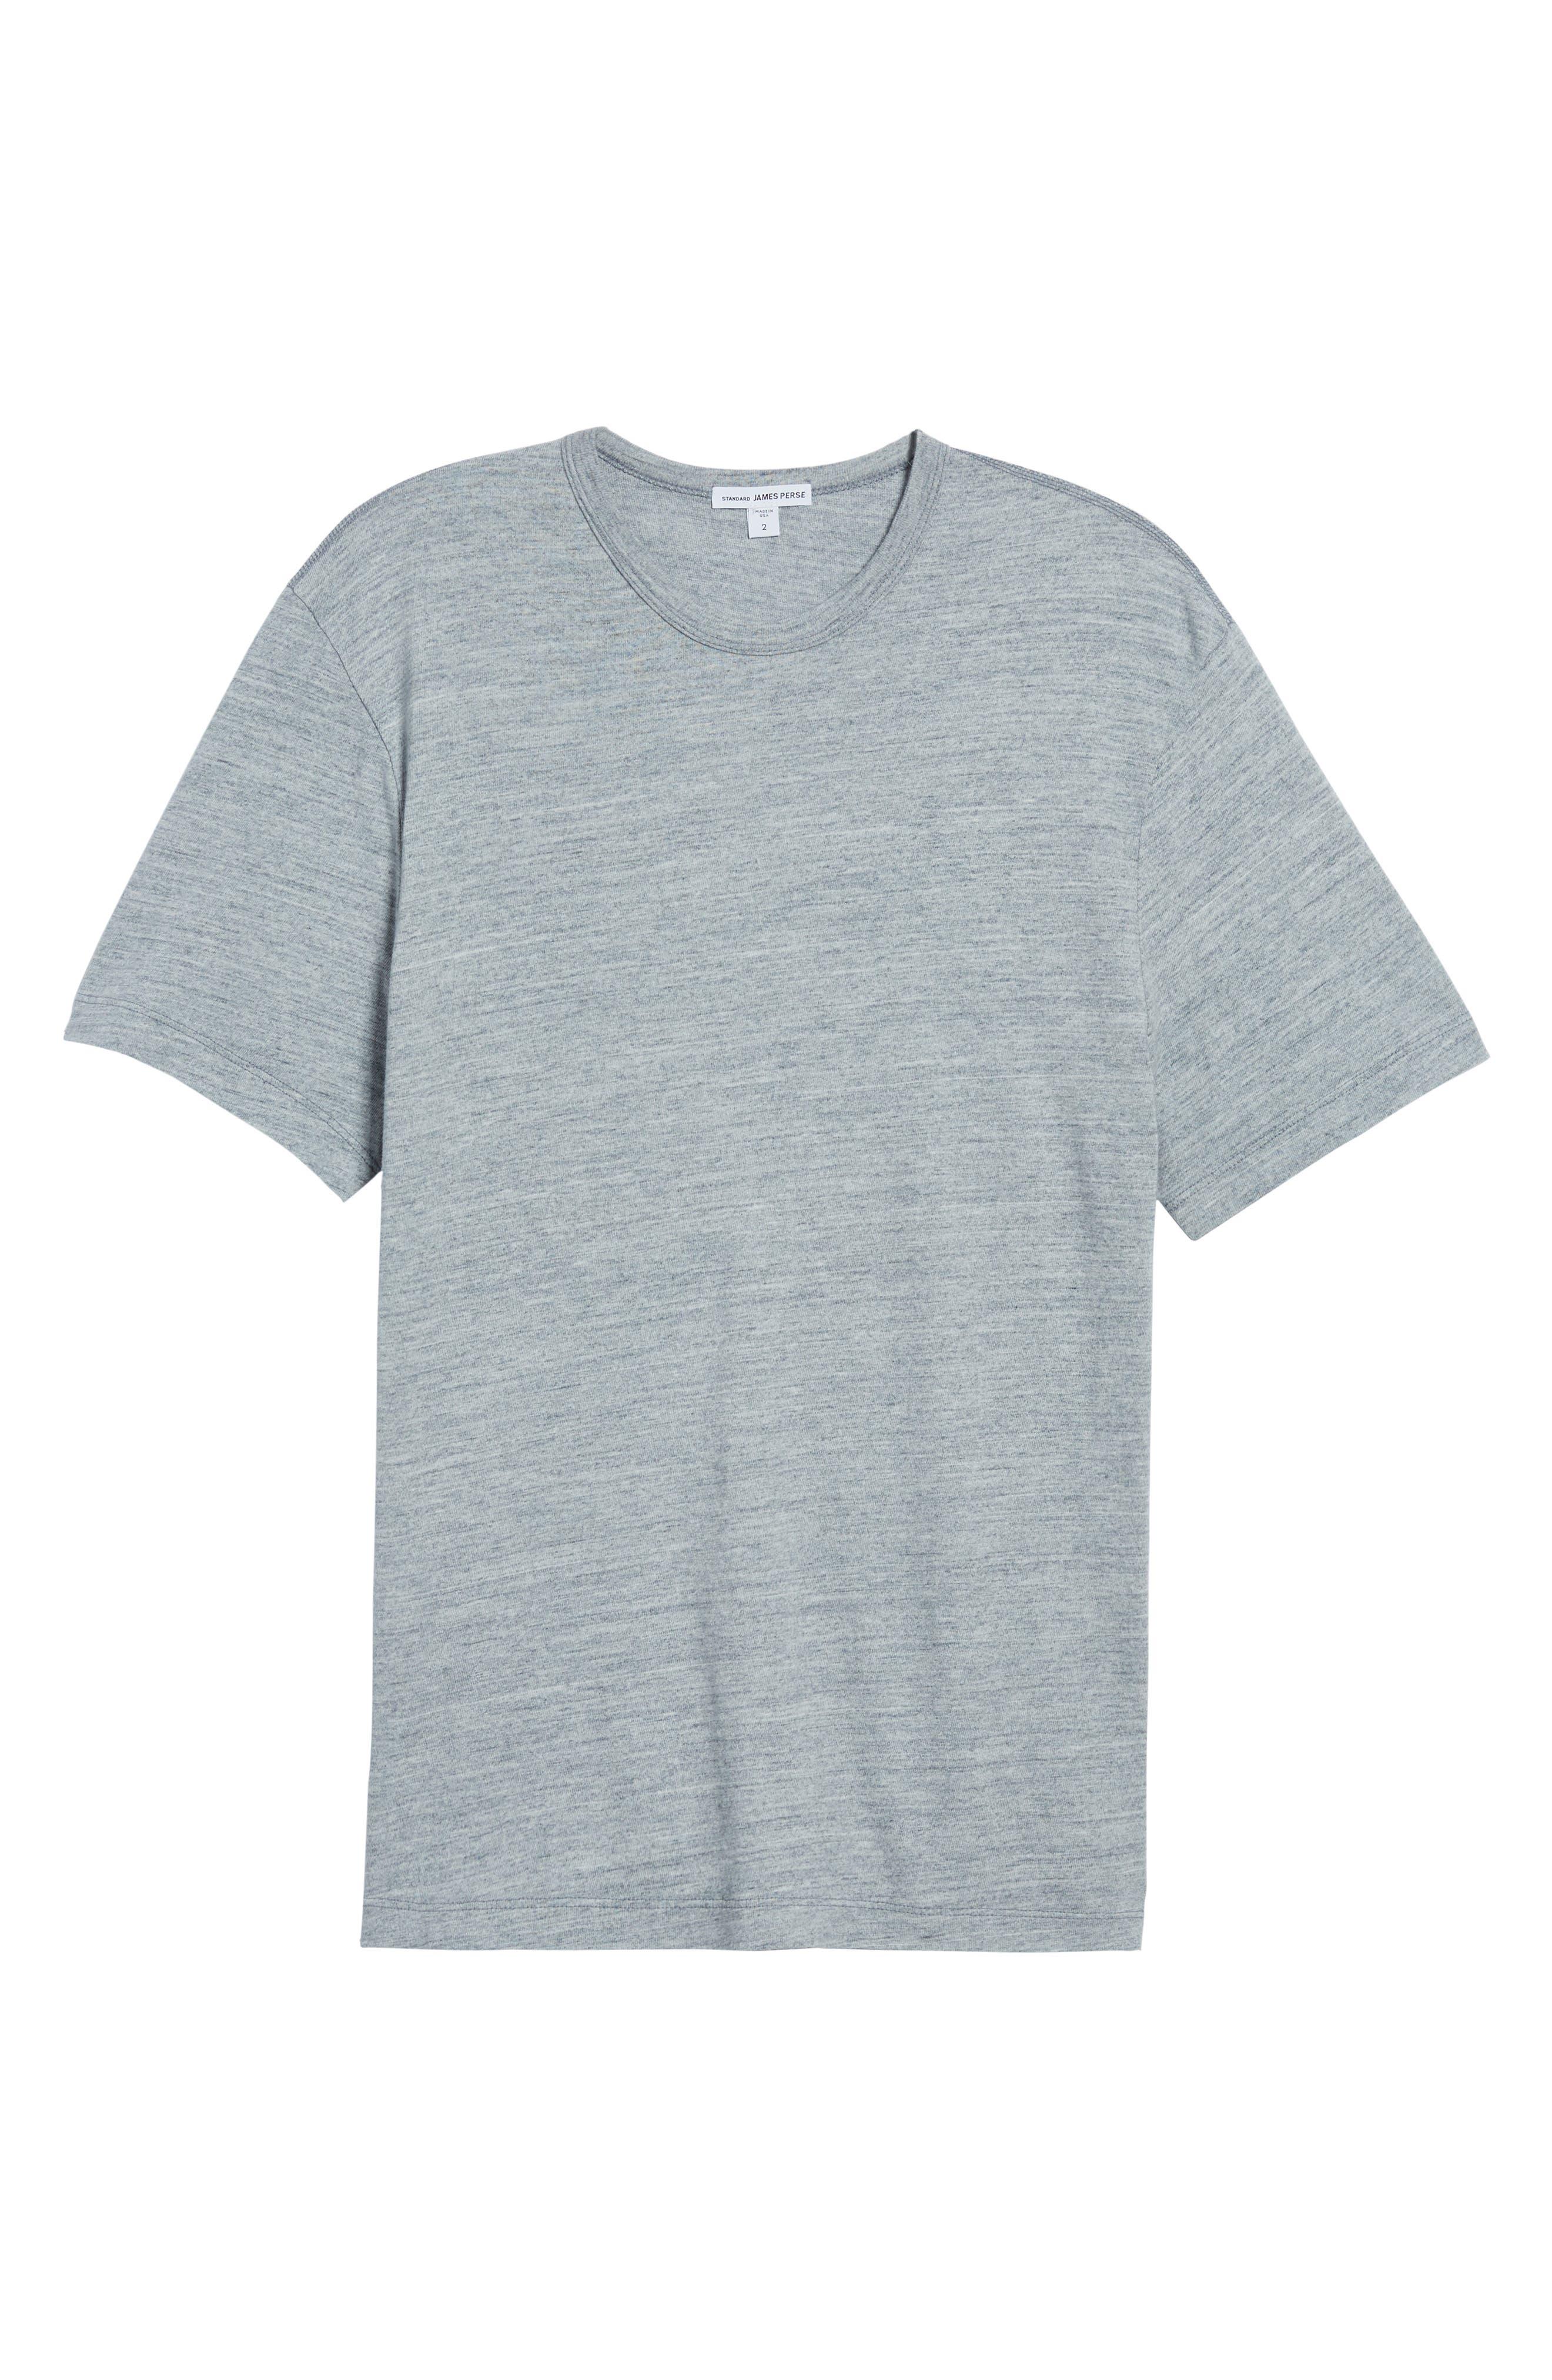 Regular Fit Top Dyed Crewneck T-Shirt,                             Alternate thumbnail 17, color,